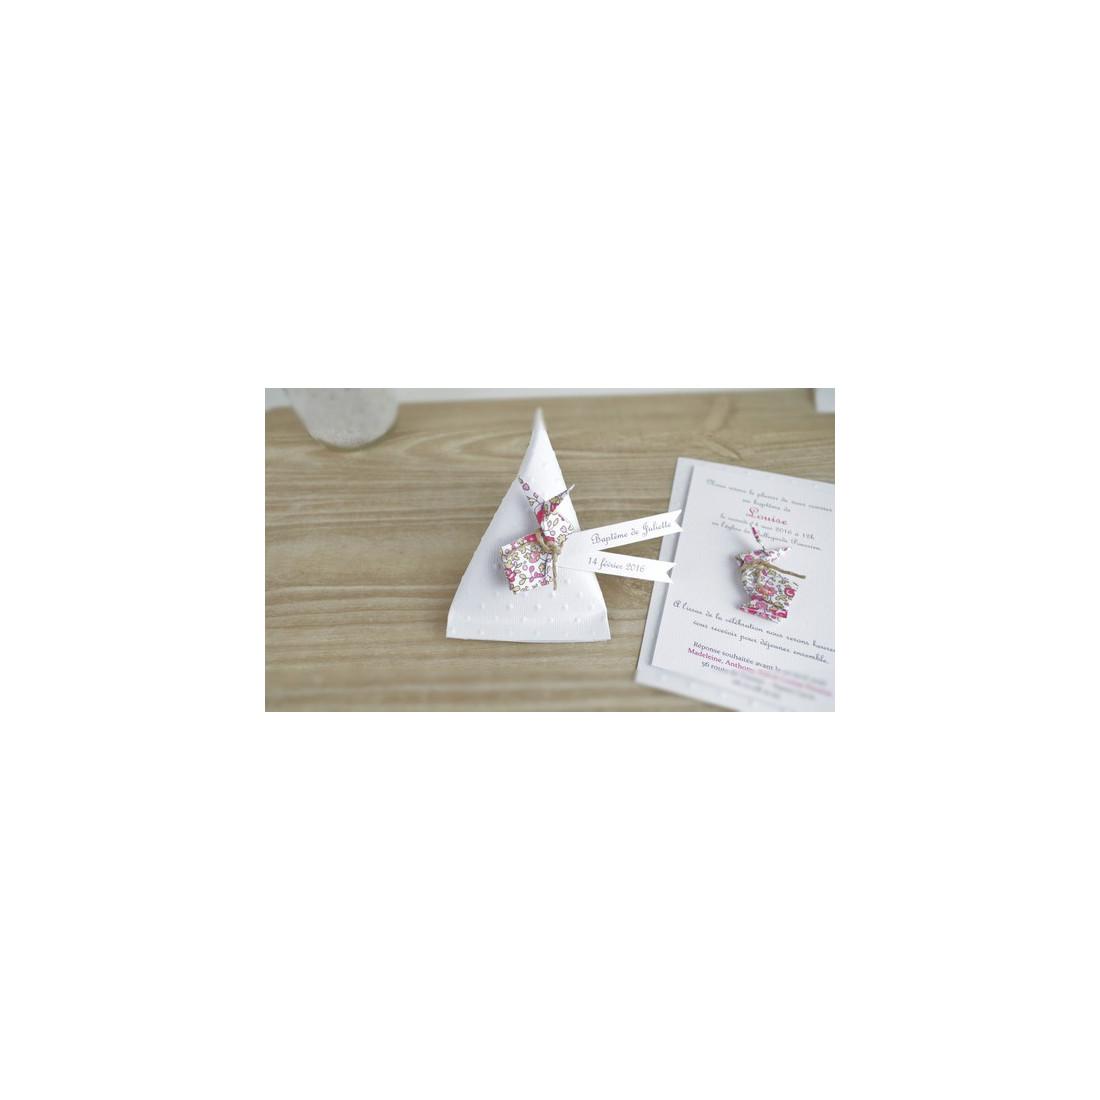 boite a dragees berlingotlapin en origami liberty eloise cadeau de remerciement invites. Black Bedroom Furniture Sets. Home Design Ideas